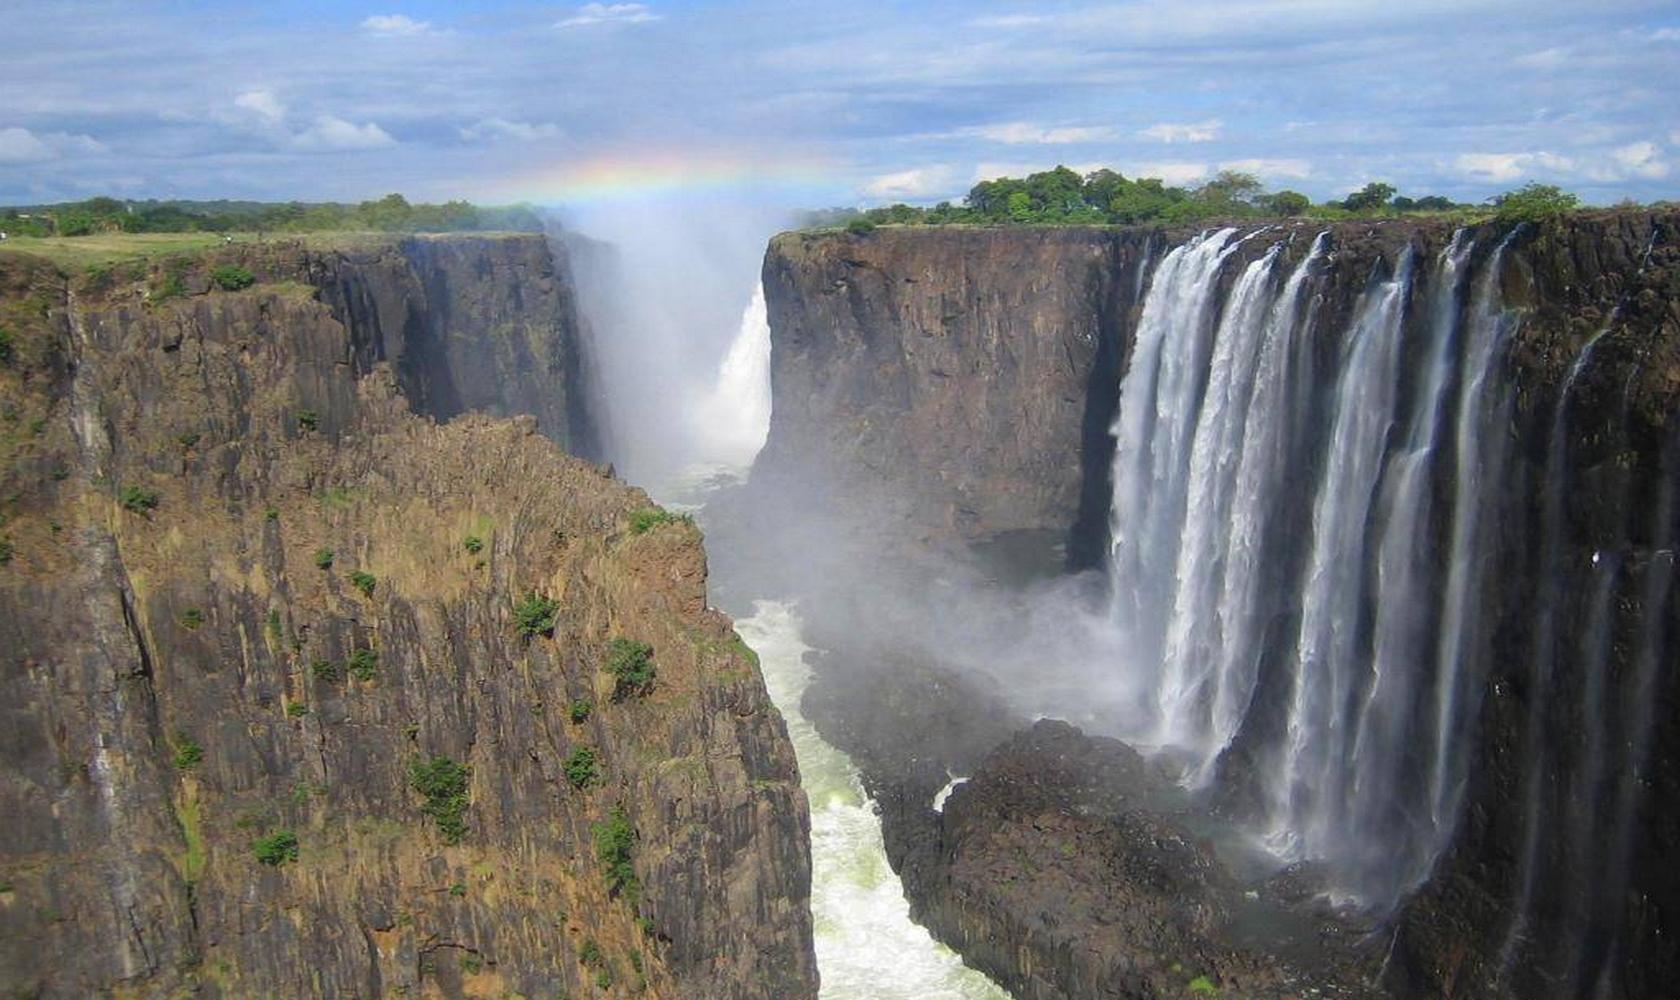 Africa_Chutes_Victoria_003-1680-1000.jpg